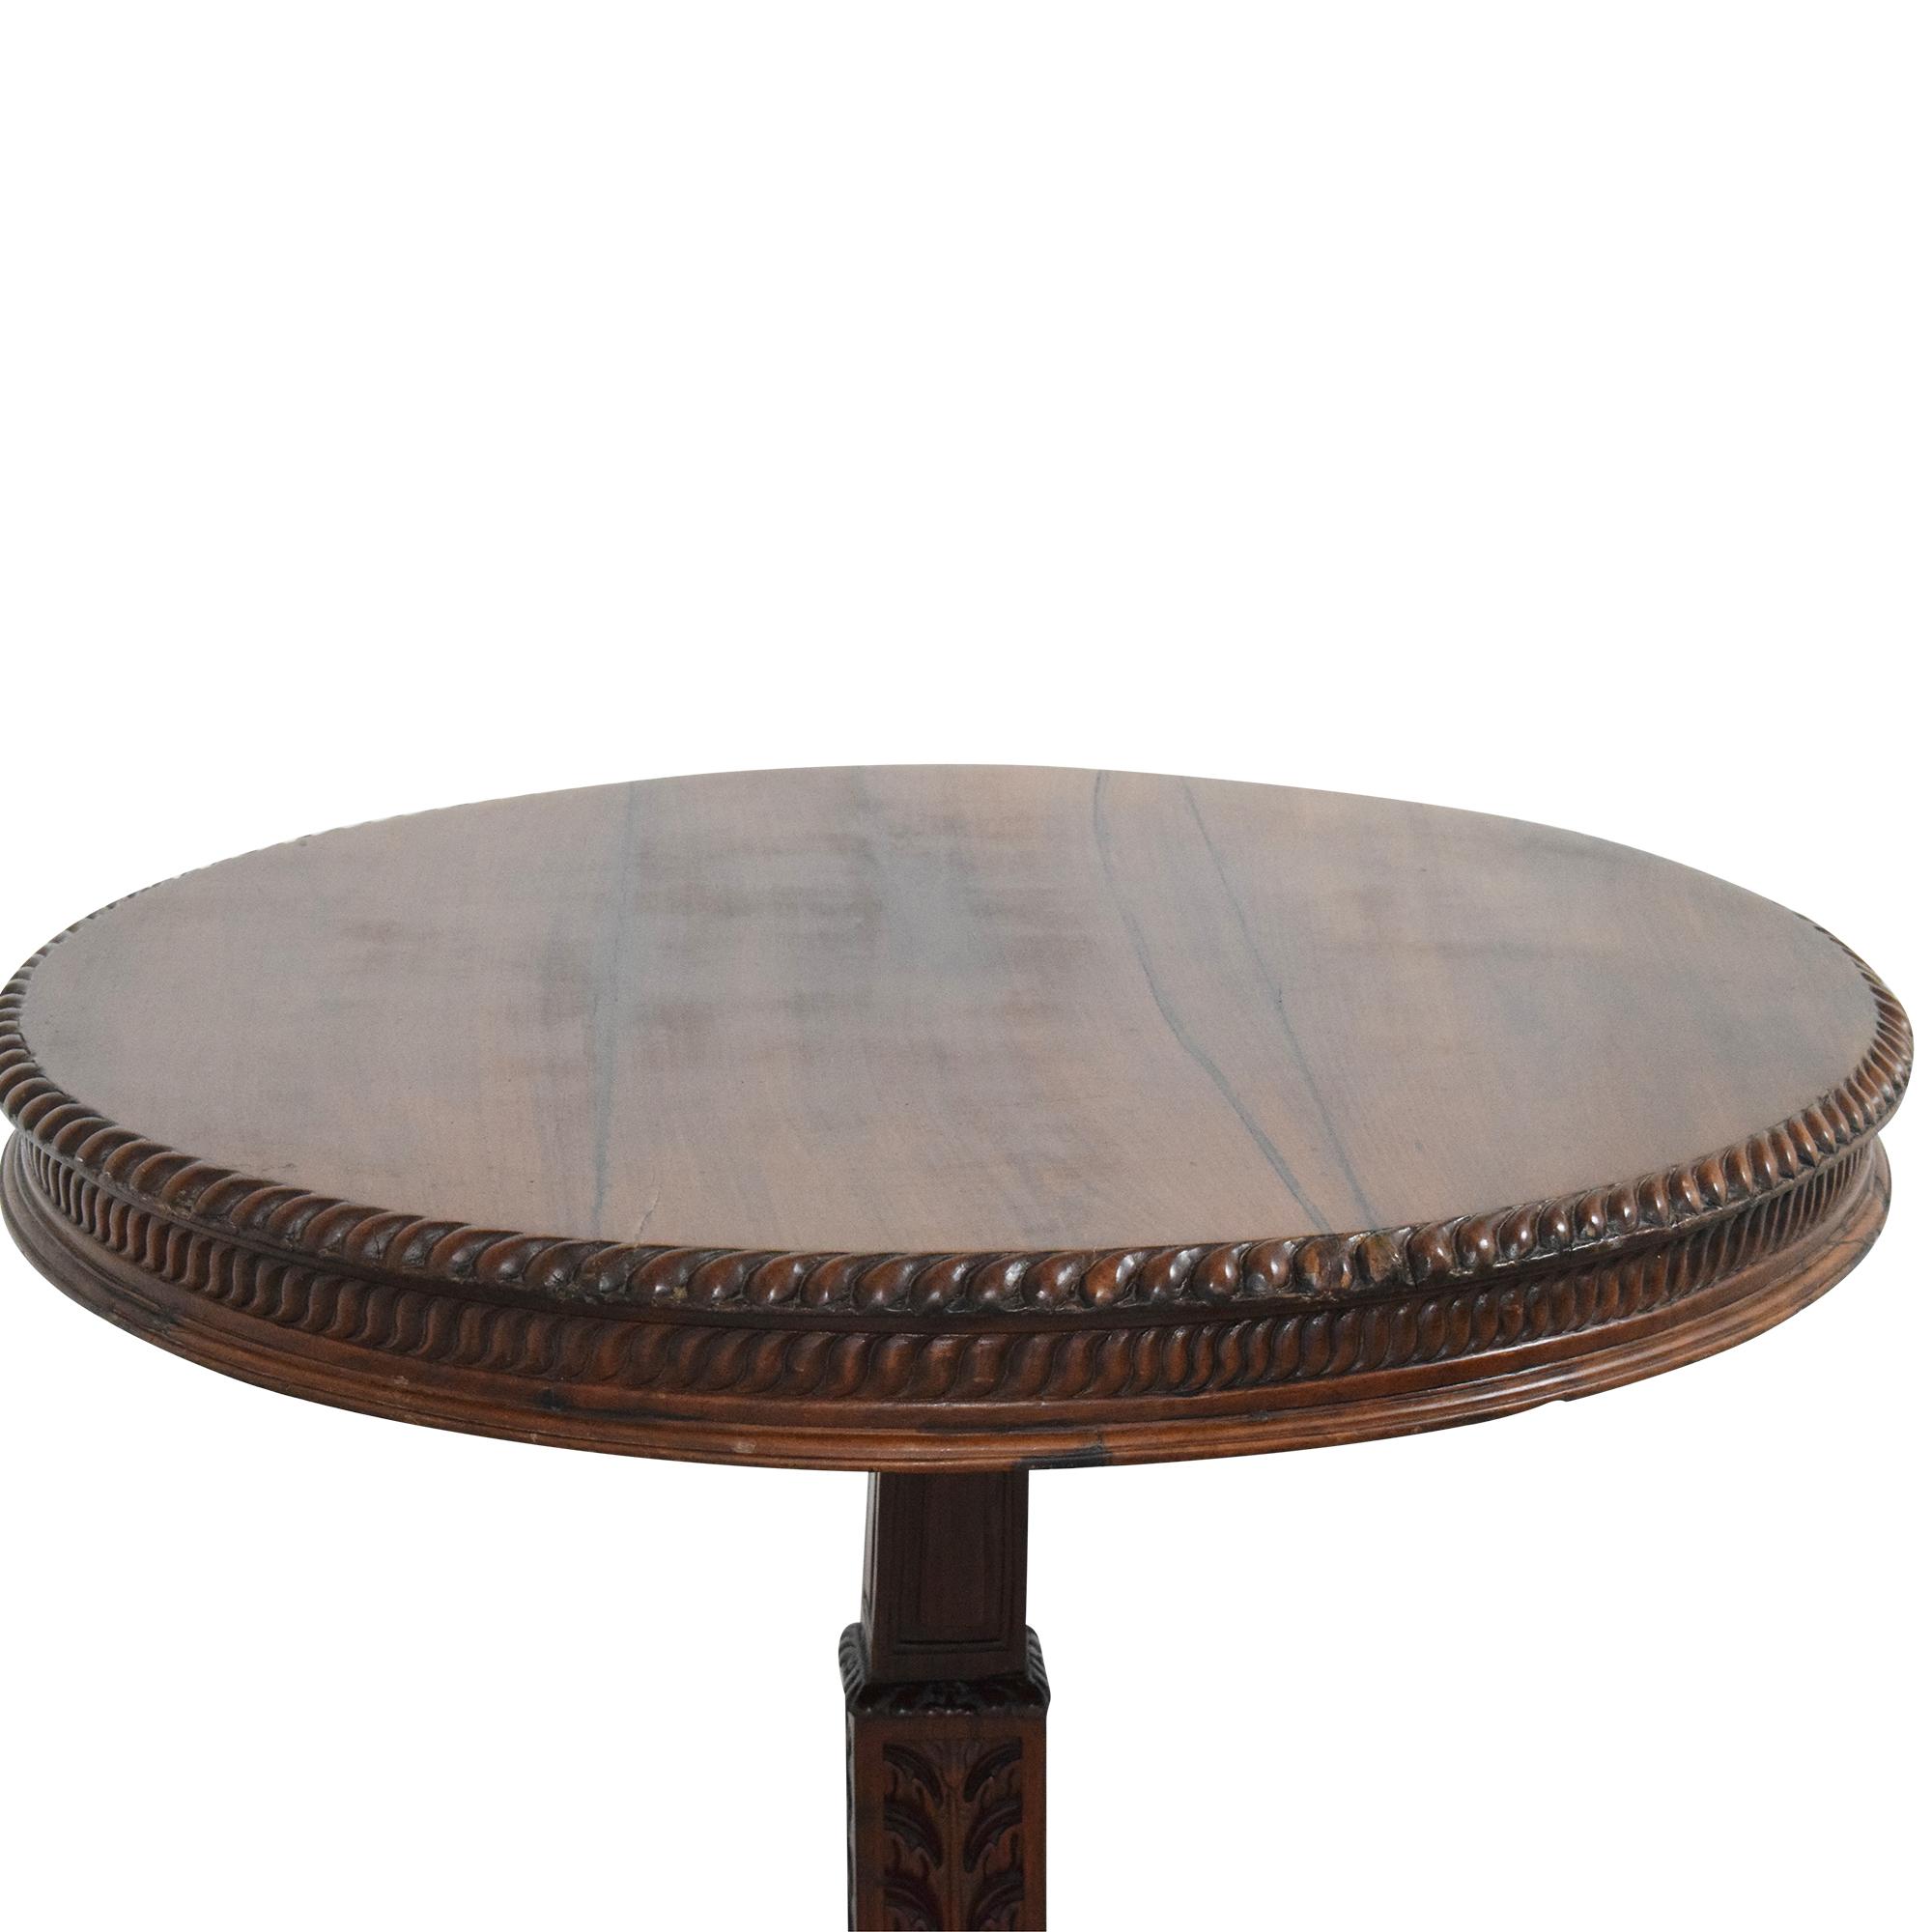 Vintage-Style Pedestal Game Table nj